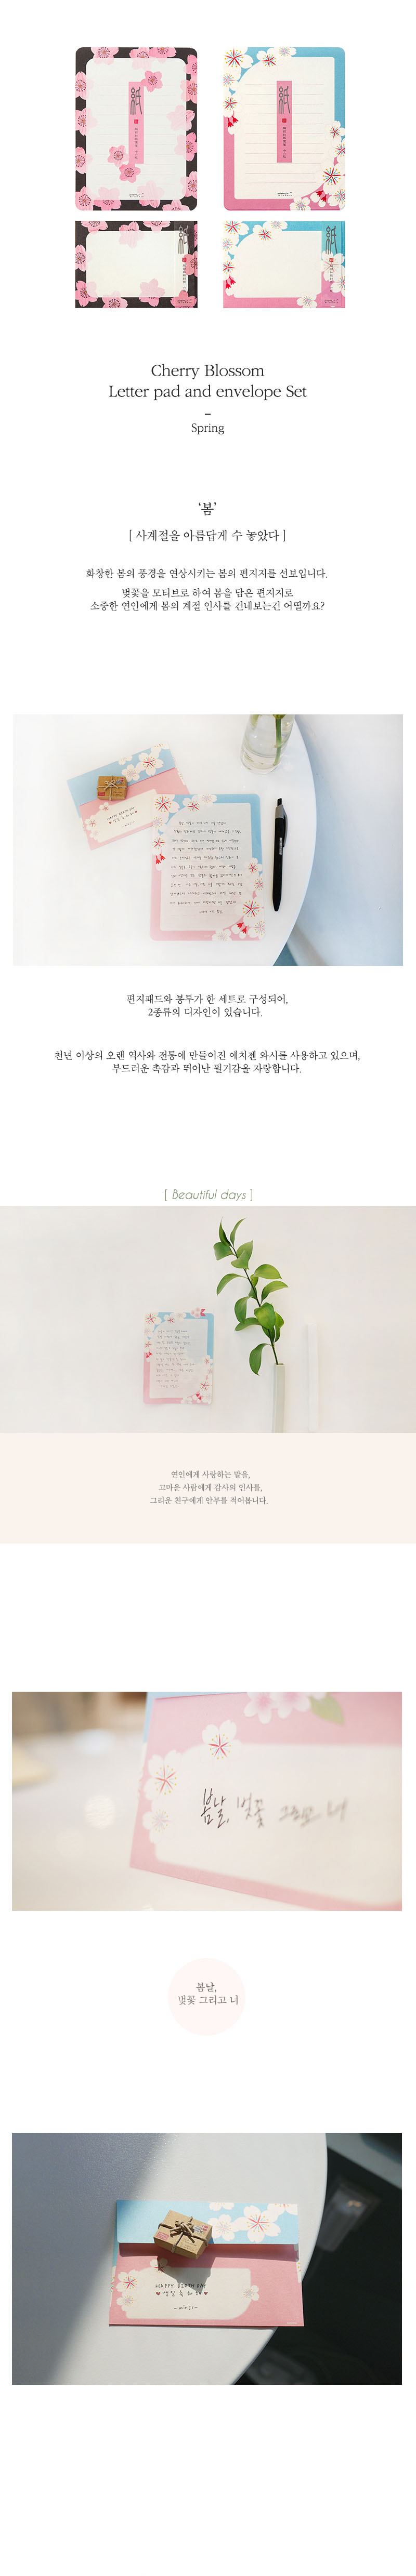 Cherry Blossom Letter pad and envelope Set13,500원-미도리디자인문구, 카드/편지/봉투, 디자인편지, 심플바보사랑Cherry Blossom Letter pad and envelope Set13,500원-미도리디자인문구, 카드/편지/봉투, 디자인편지, 심플바보사랑